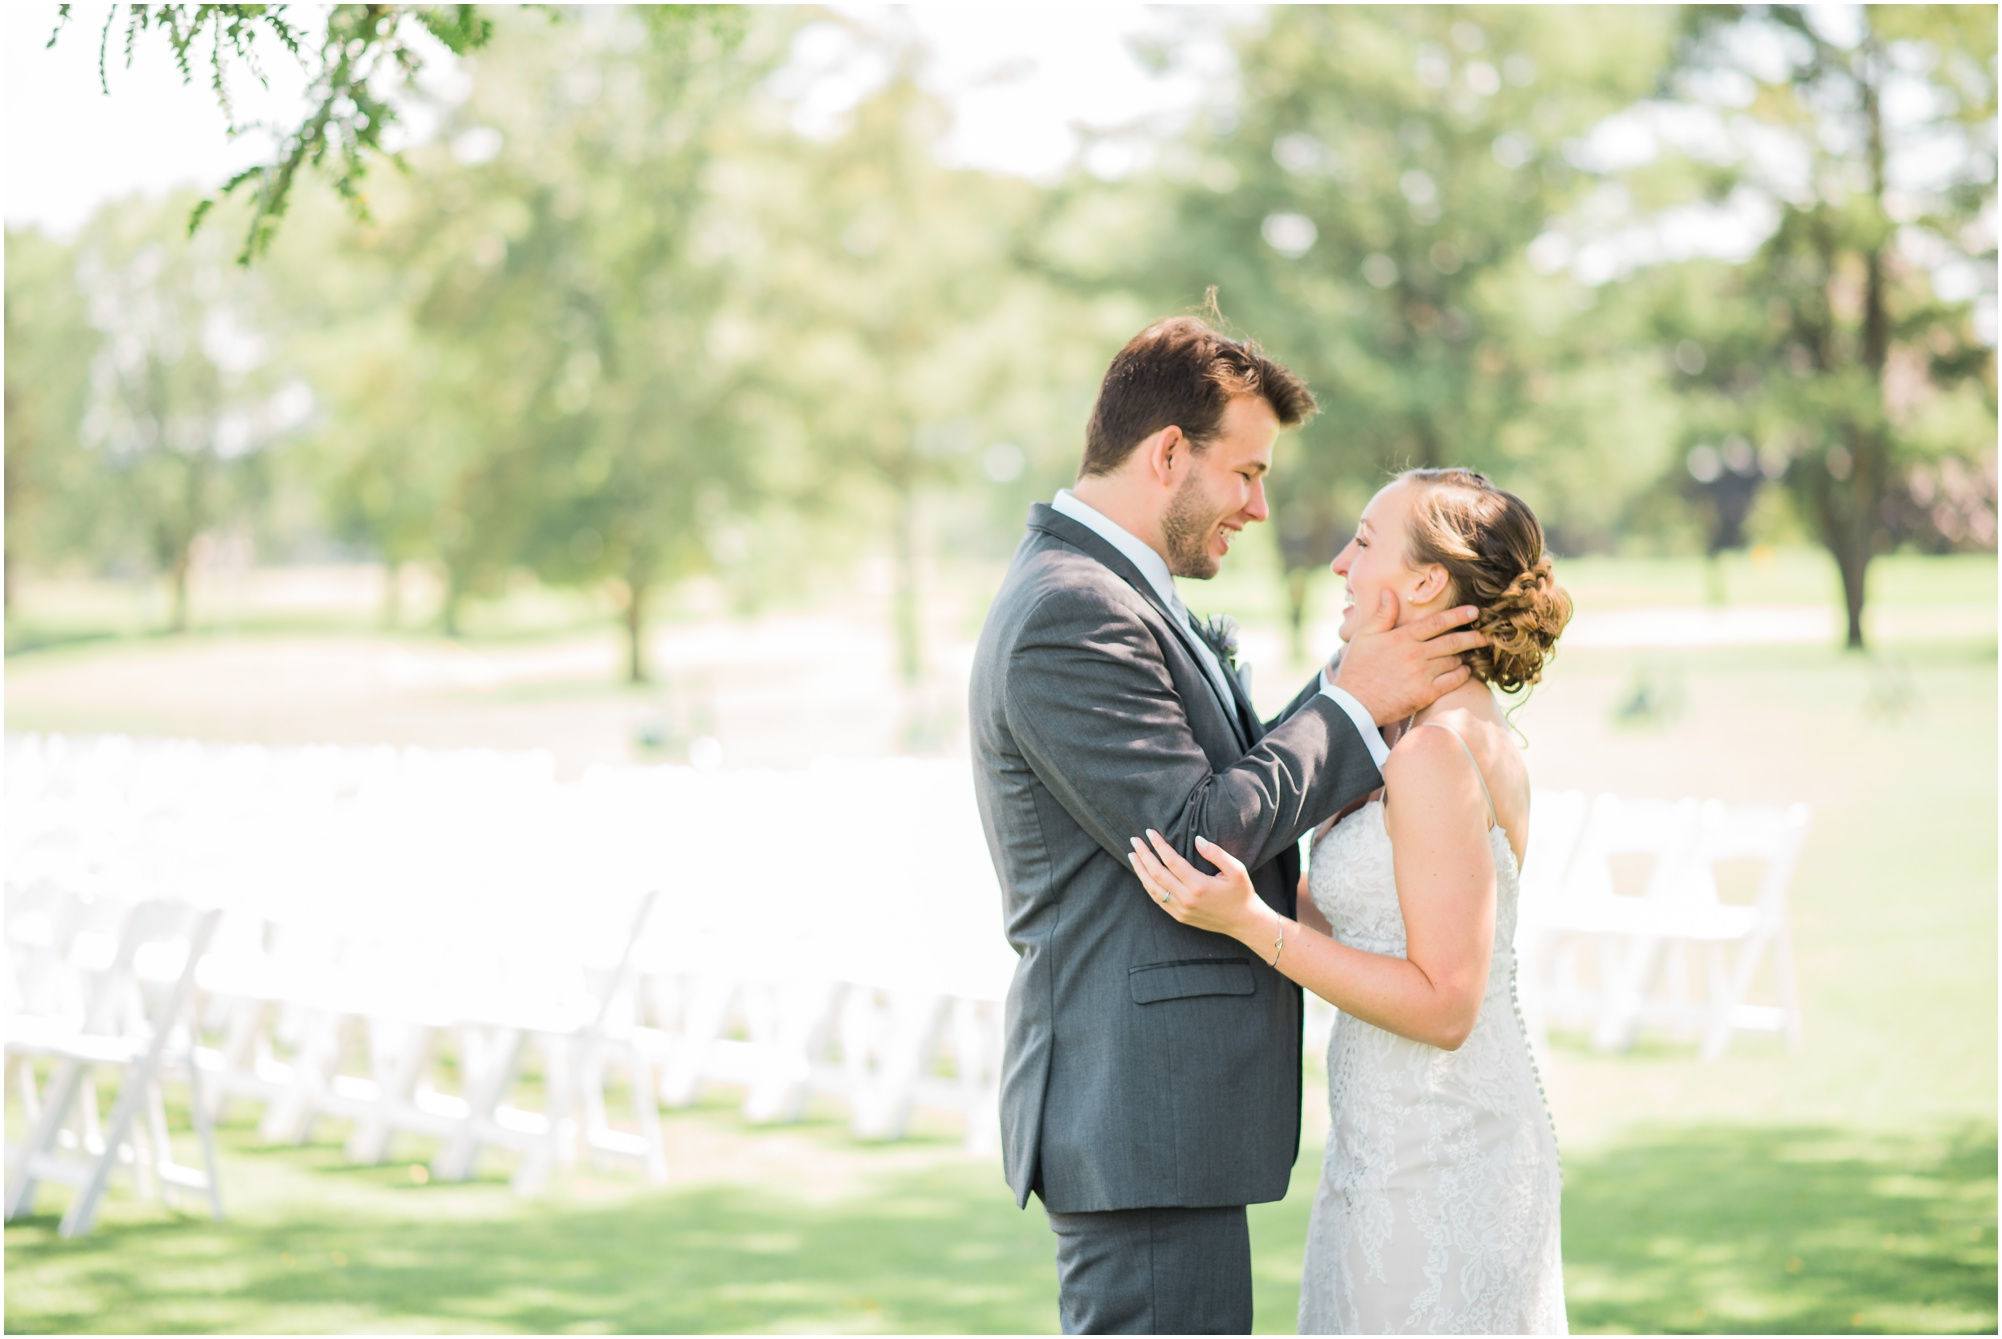 Wisconsin-Wedding-Photographer-Reedsburg-Country-Club-Kaela-and Matt-Wedding-56.jpg